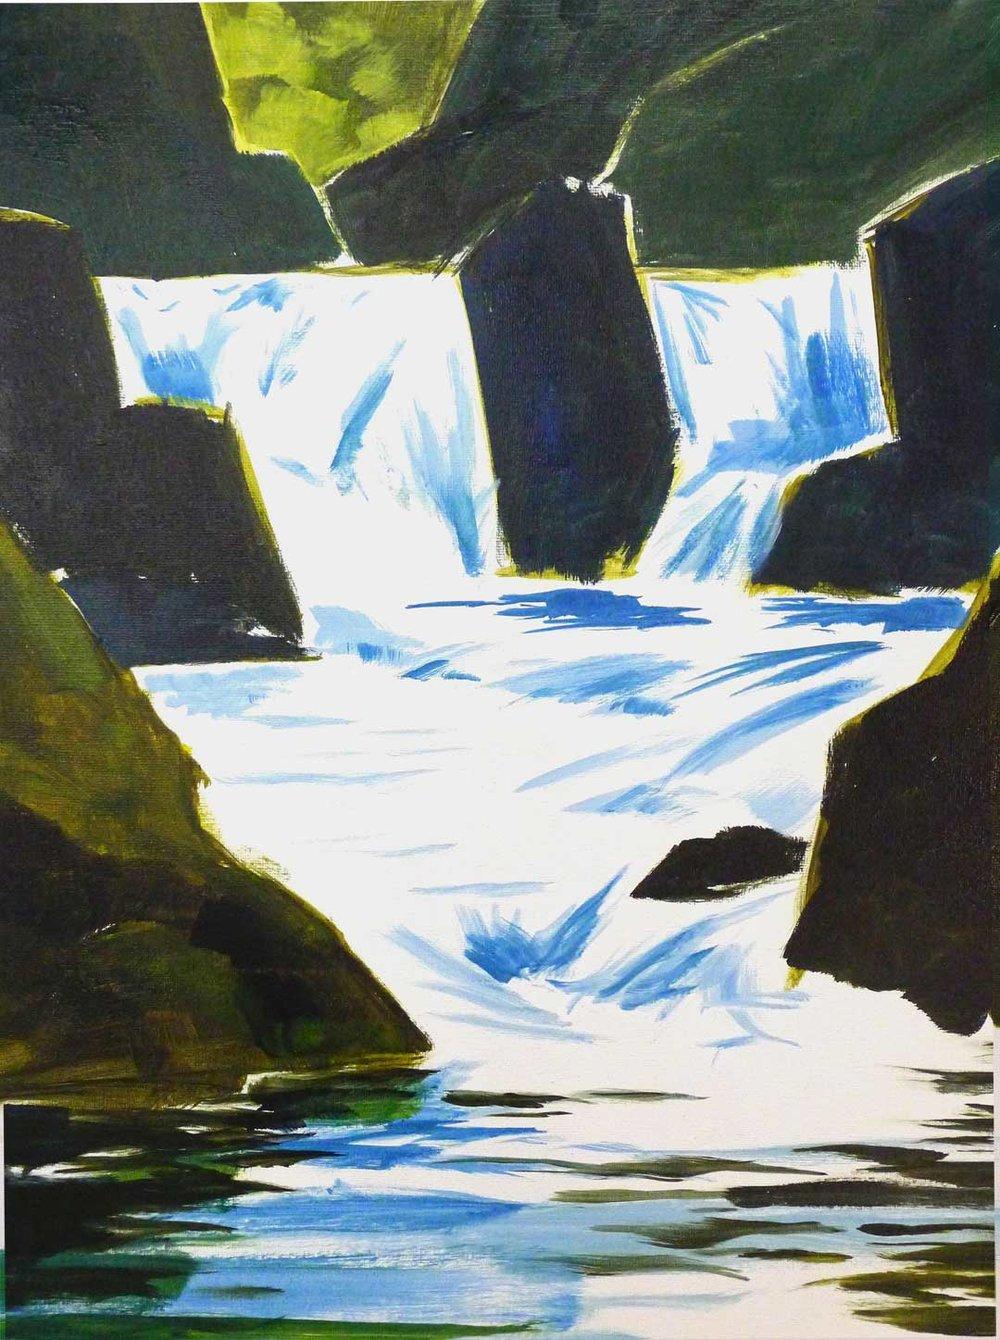 waterfall-paint-demo-5.jpg